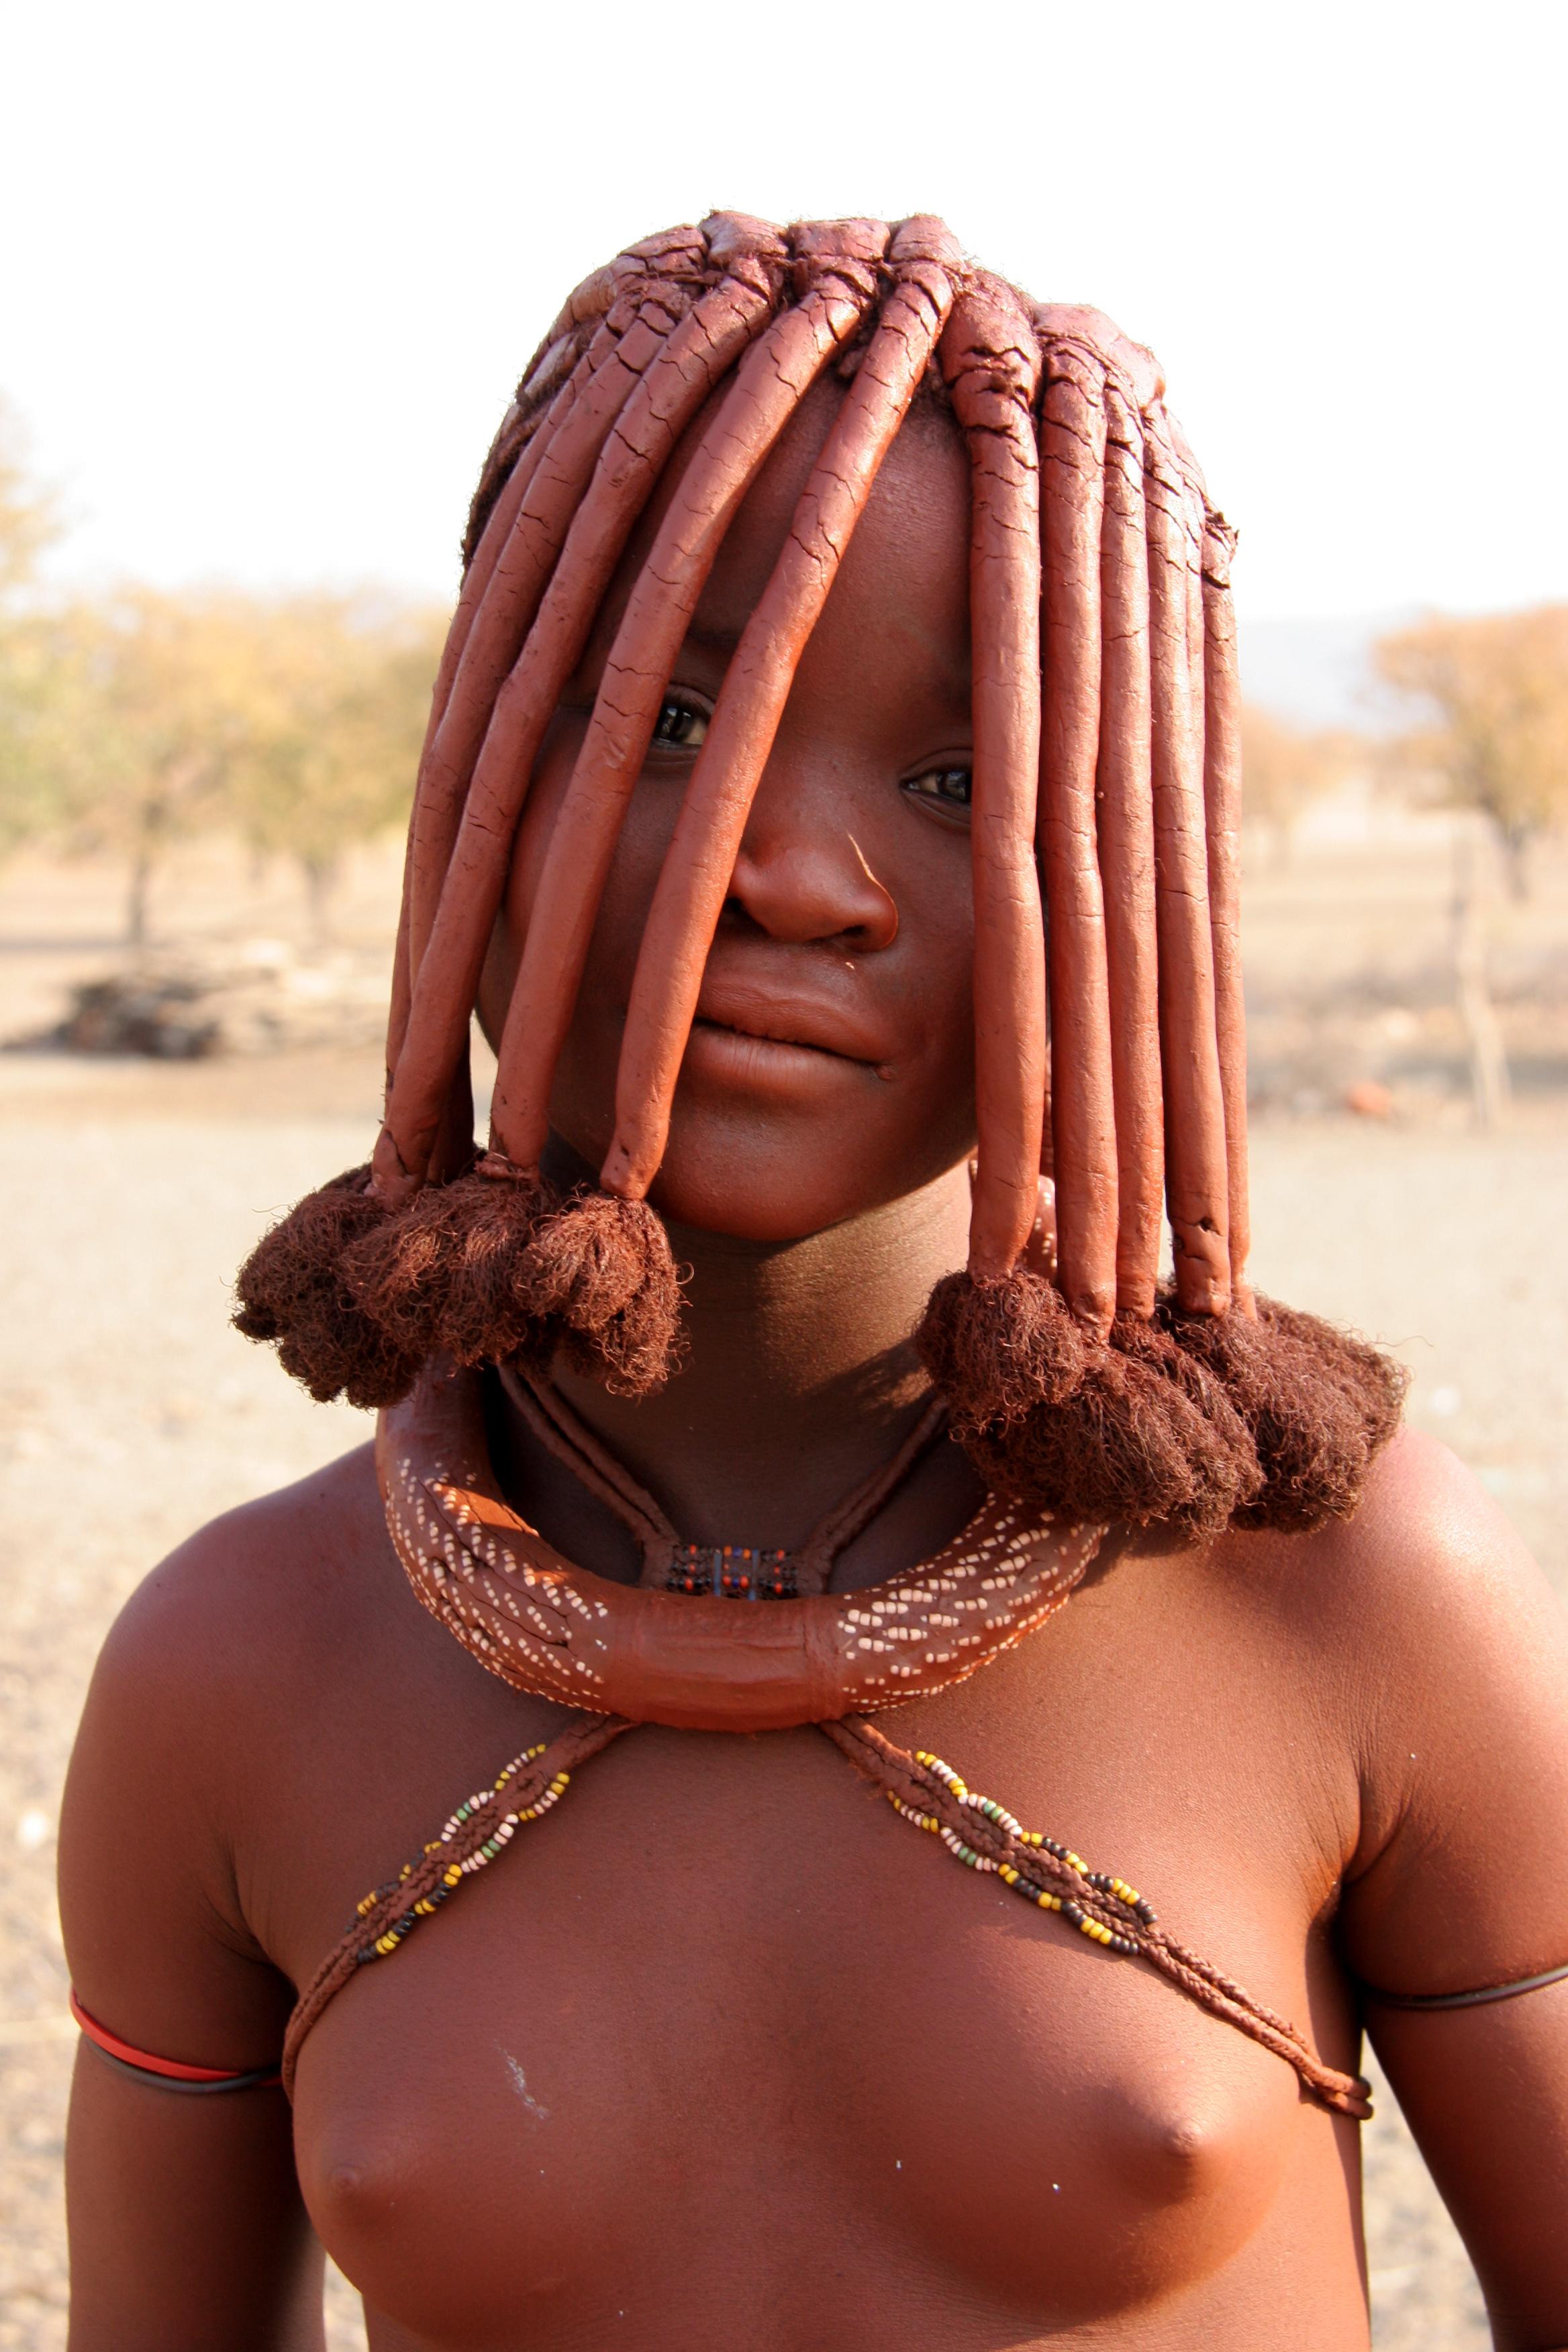 schwarz african nude tribal frauen